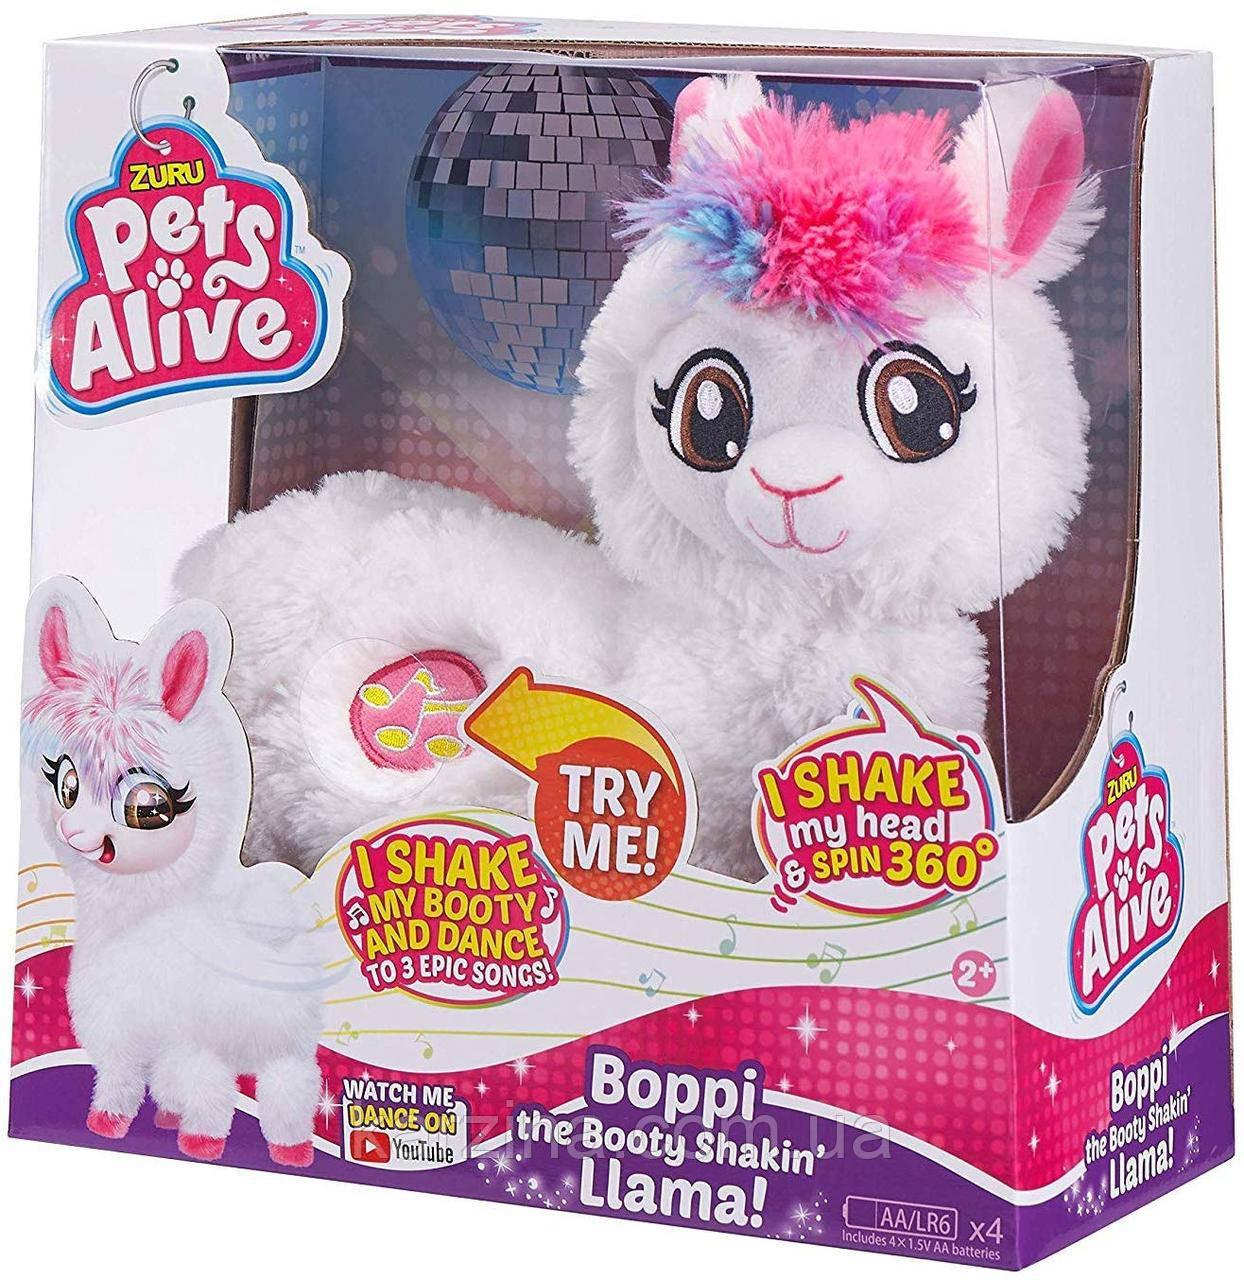 Интерактивная танцующая мягкая игрушка Pets alive Лама танцовщица белая от ZURU Оригинал